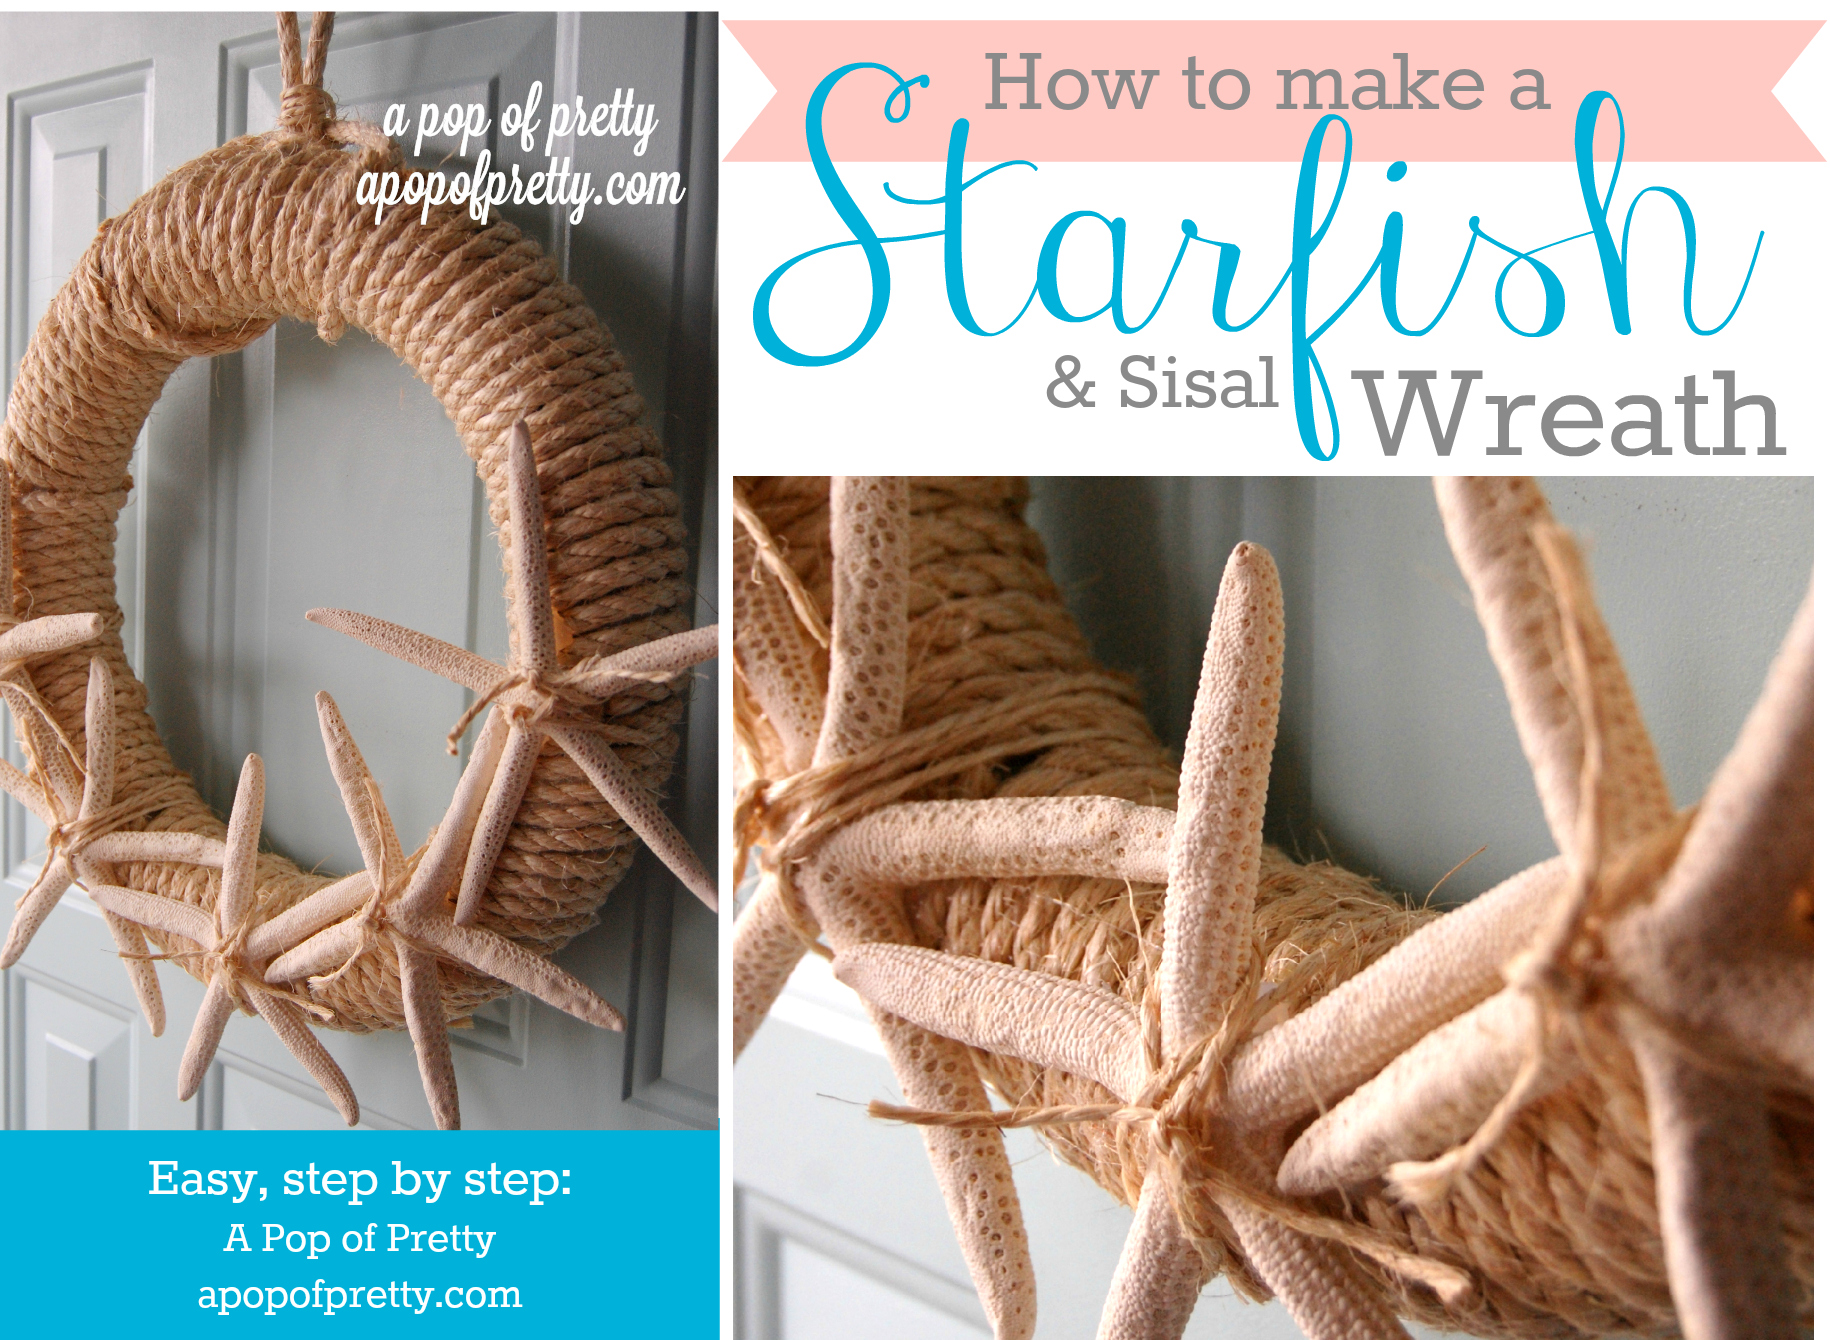 DIY Starfish Summer Wreath – A Tutorial (Summer Decorating Ideas)